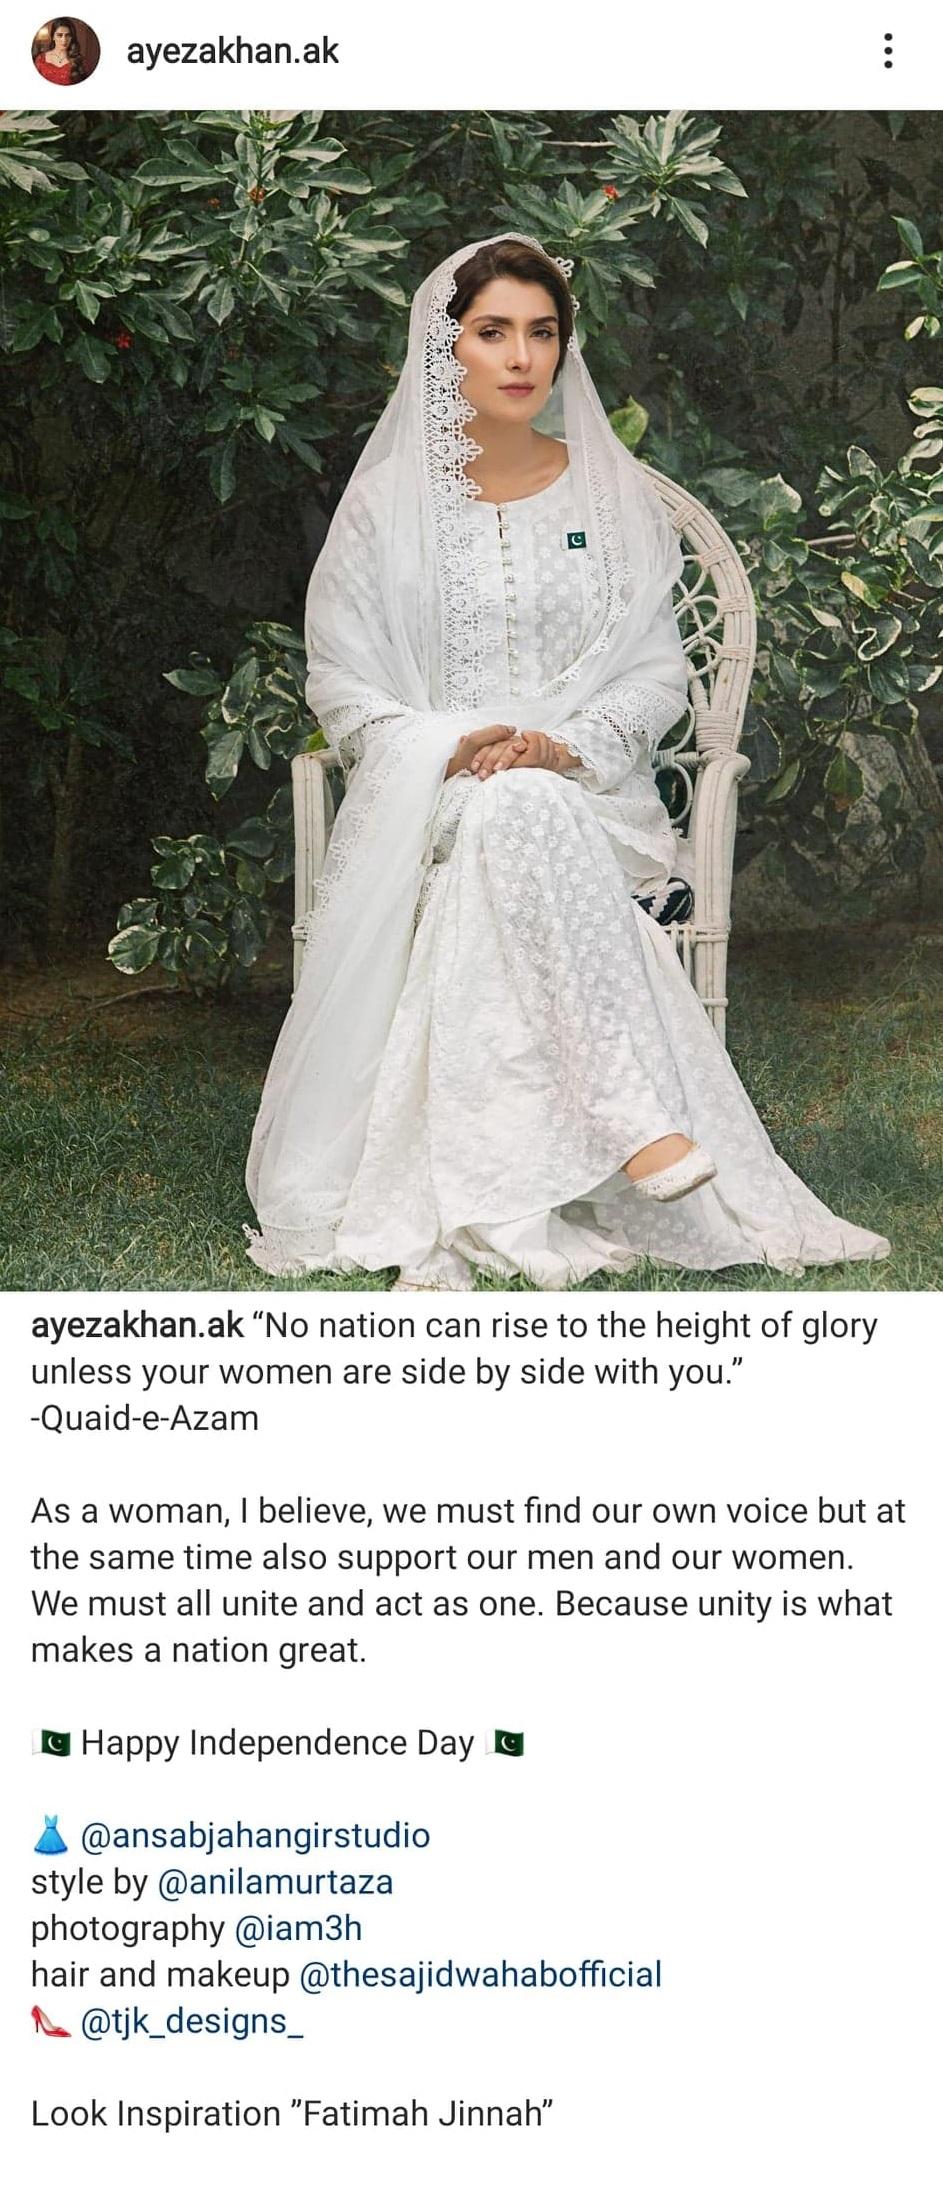 Bizarre Choices Made By Ayeza Khan